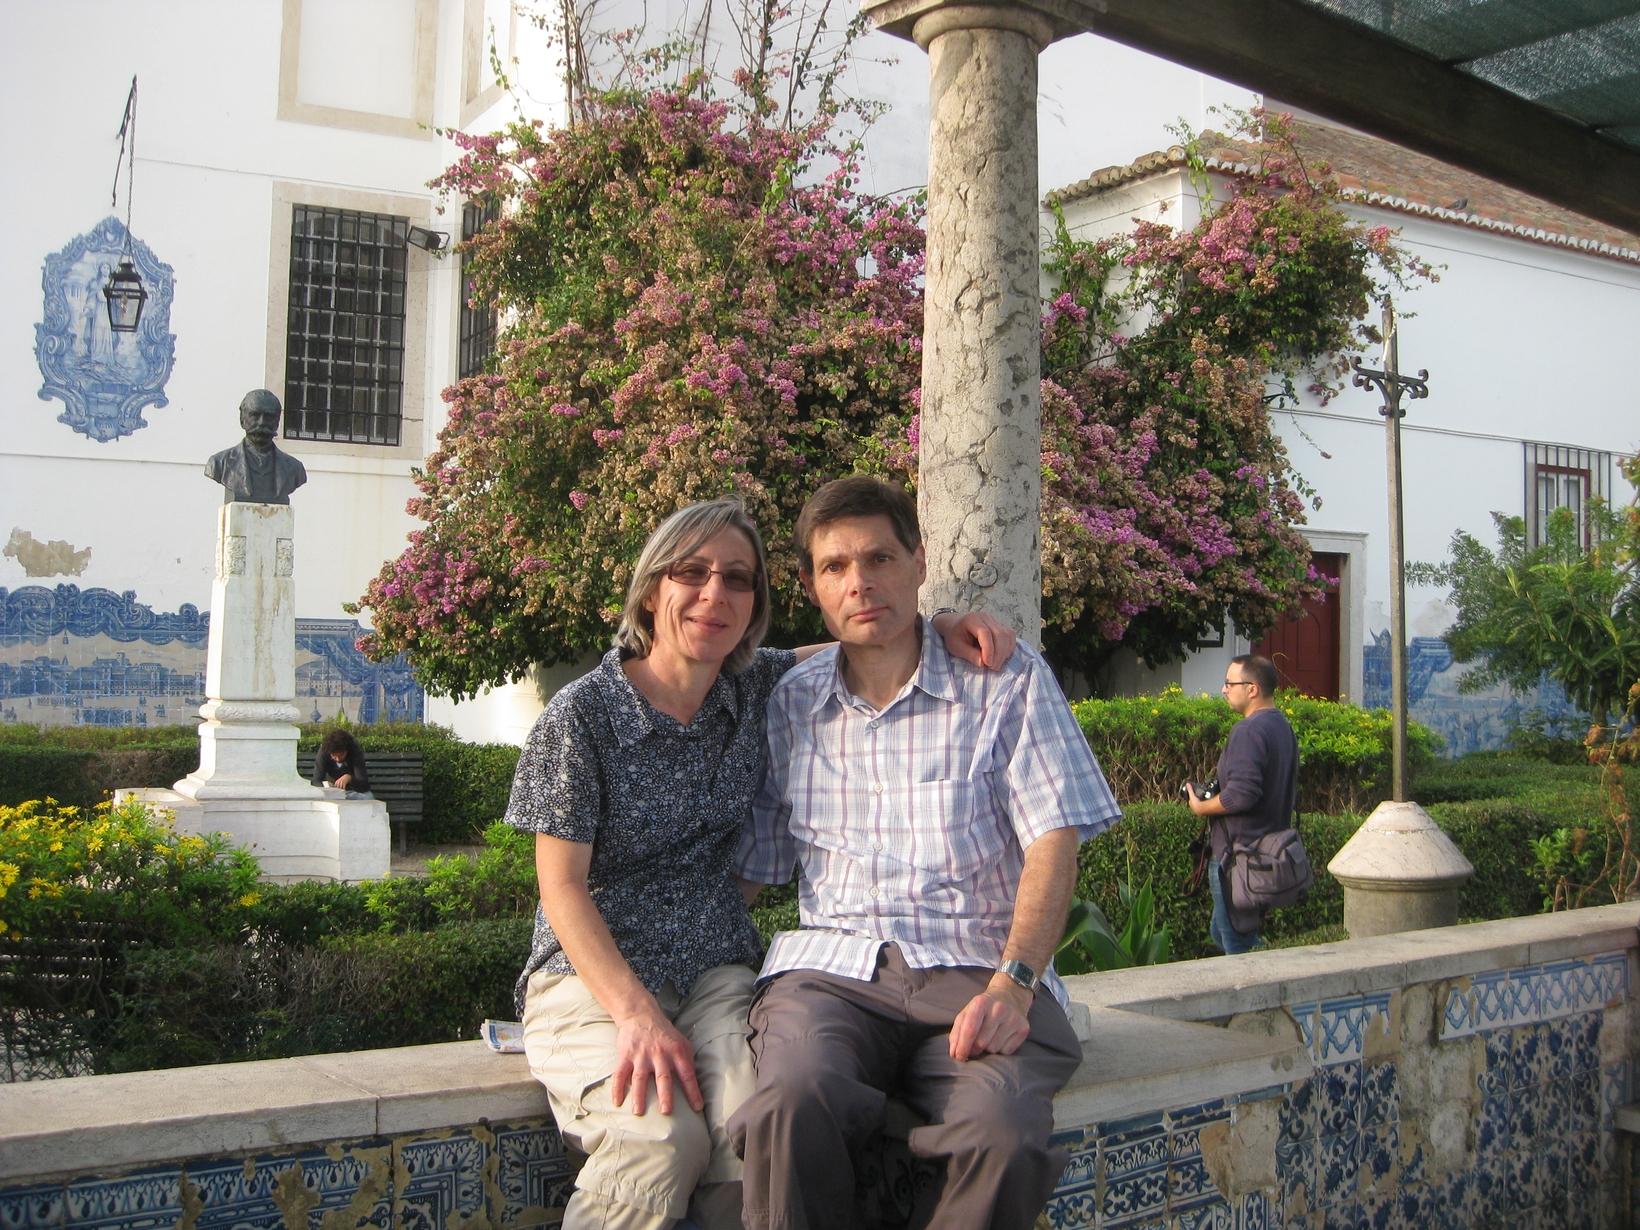 Gordon & Nicola from Sawbridgeworth, United Kingdom